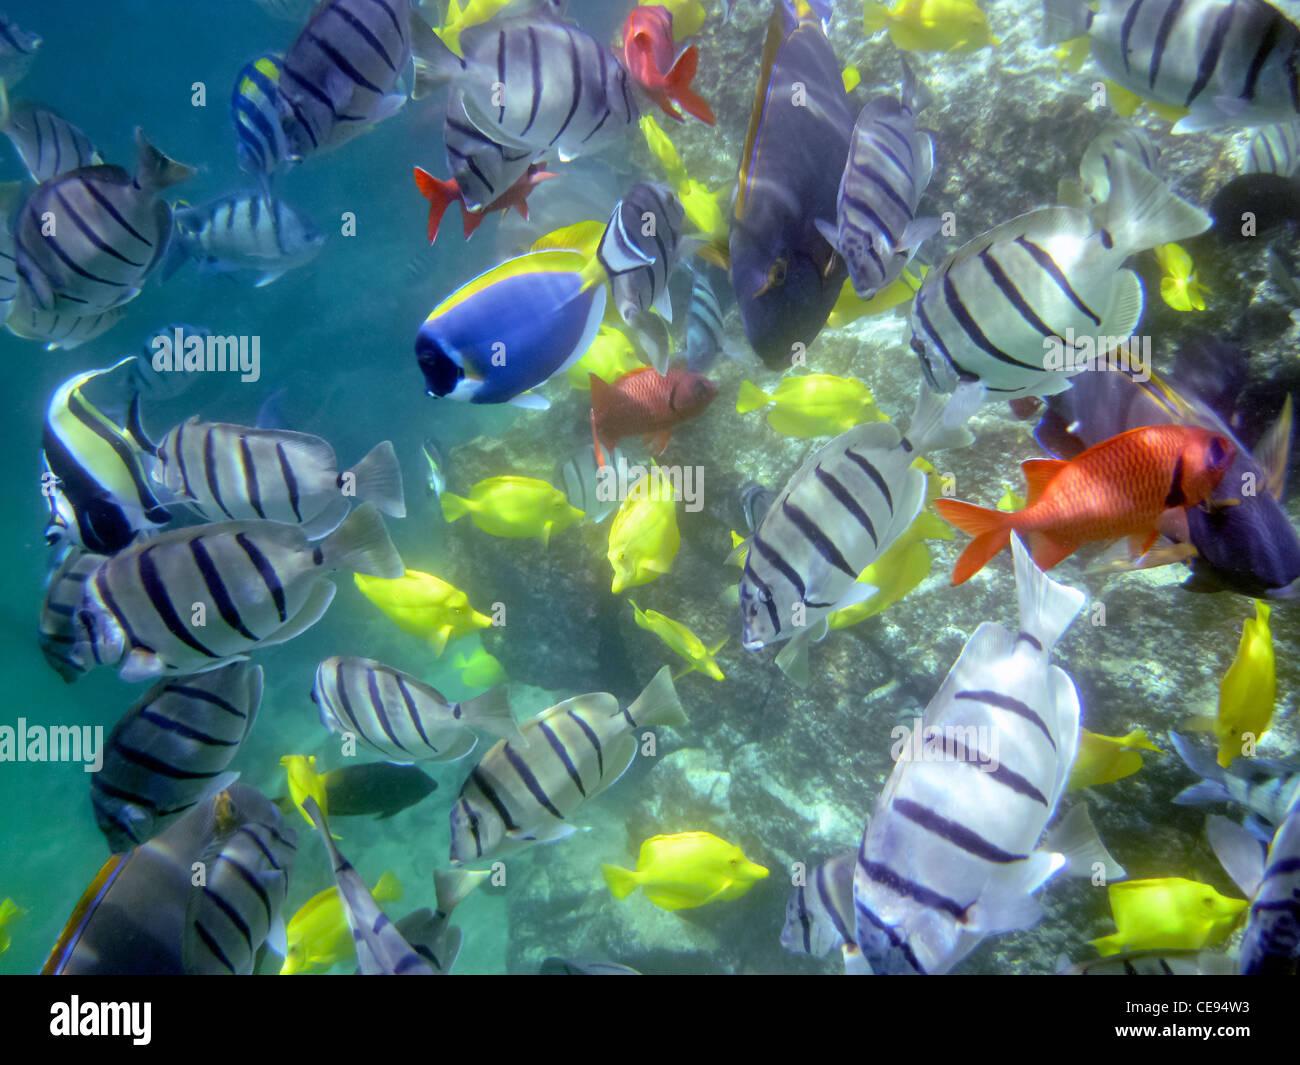 Varietà di pesci tropicali. Hawaii, la Big Island Immagini Stock